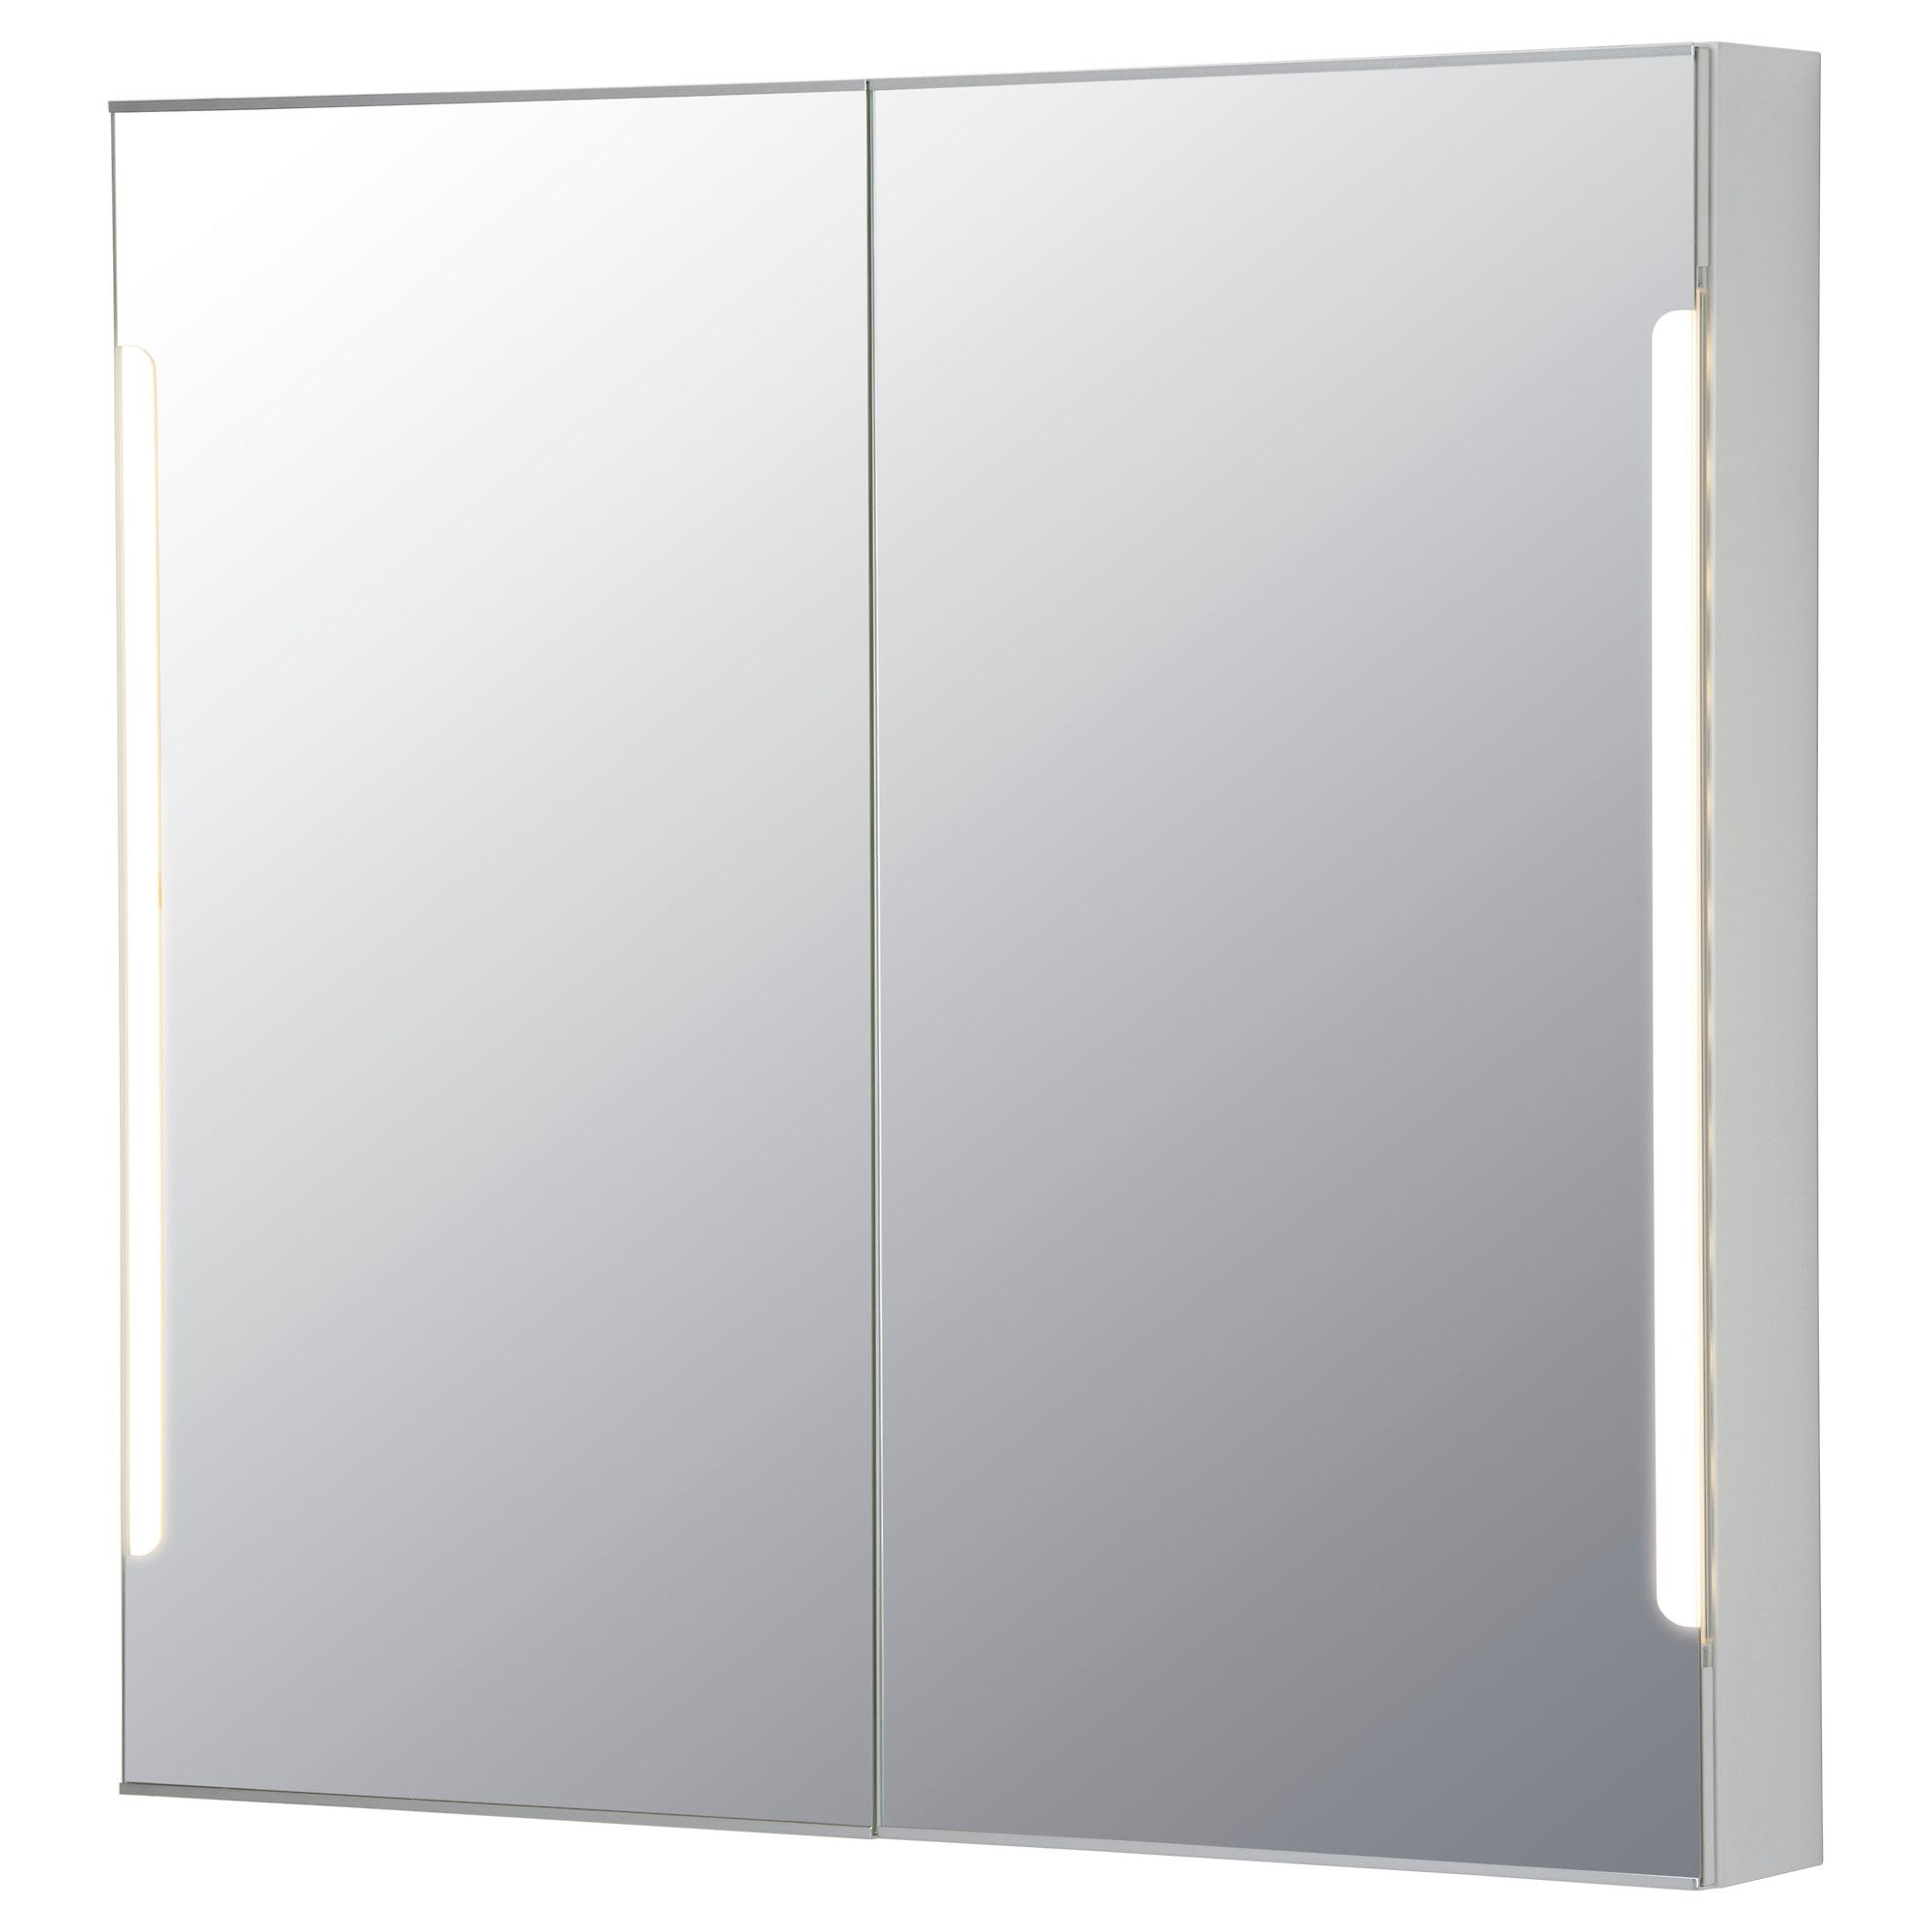 STORJORM Mirror Cabinet W 2 Doors Light White